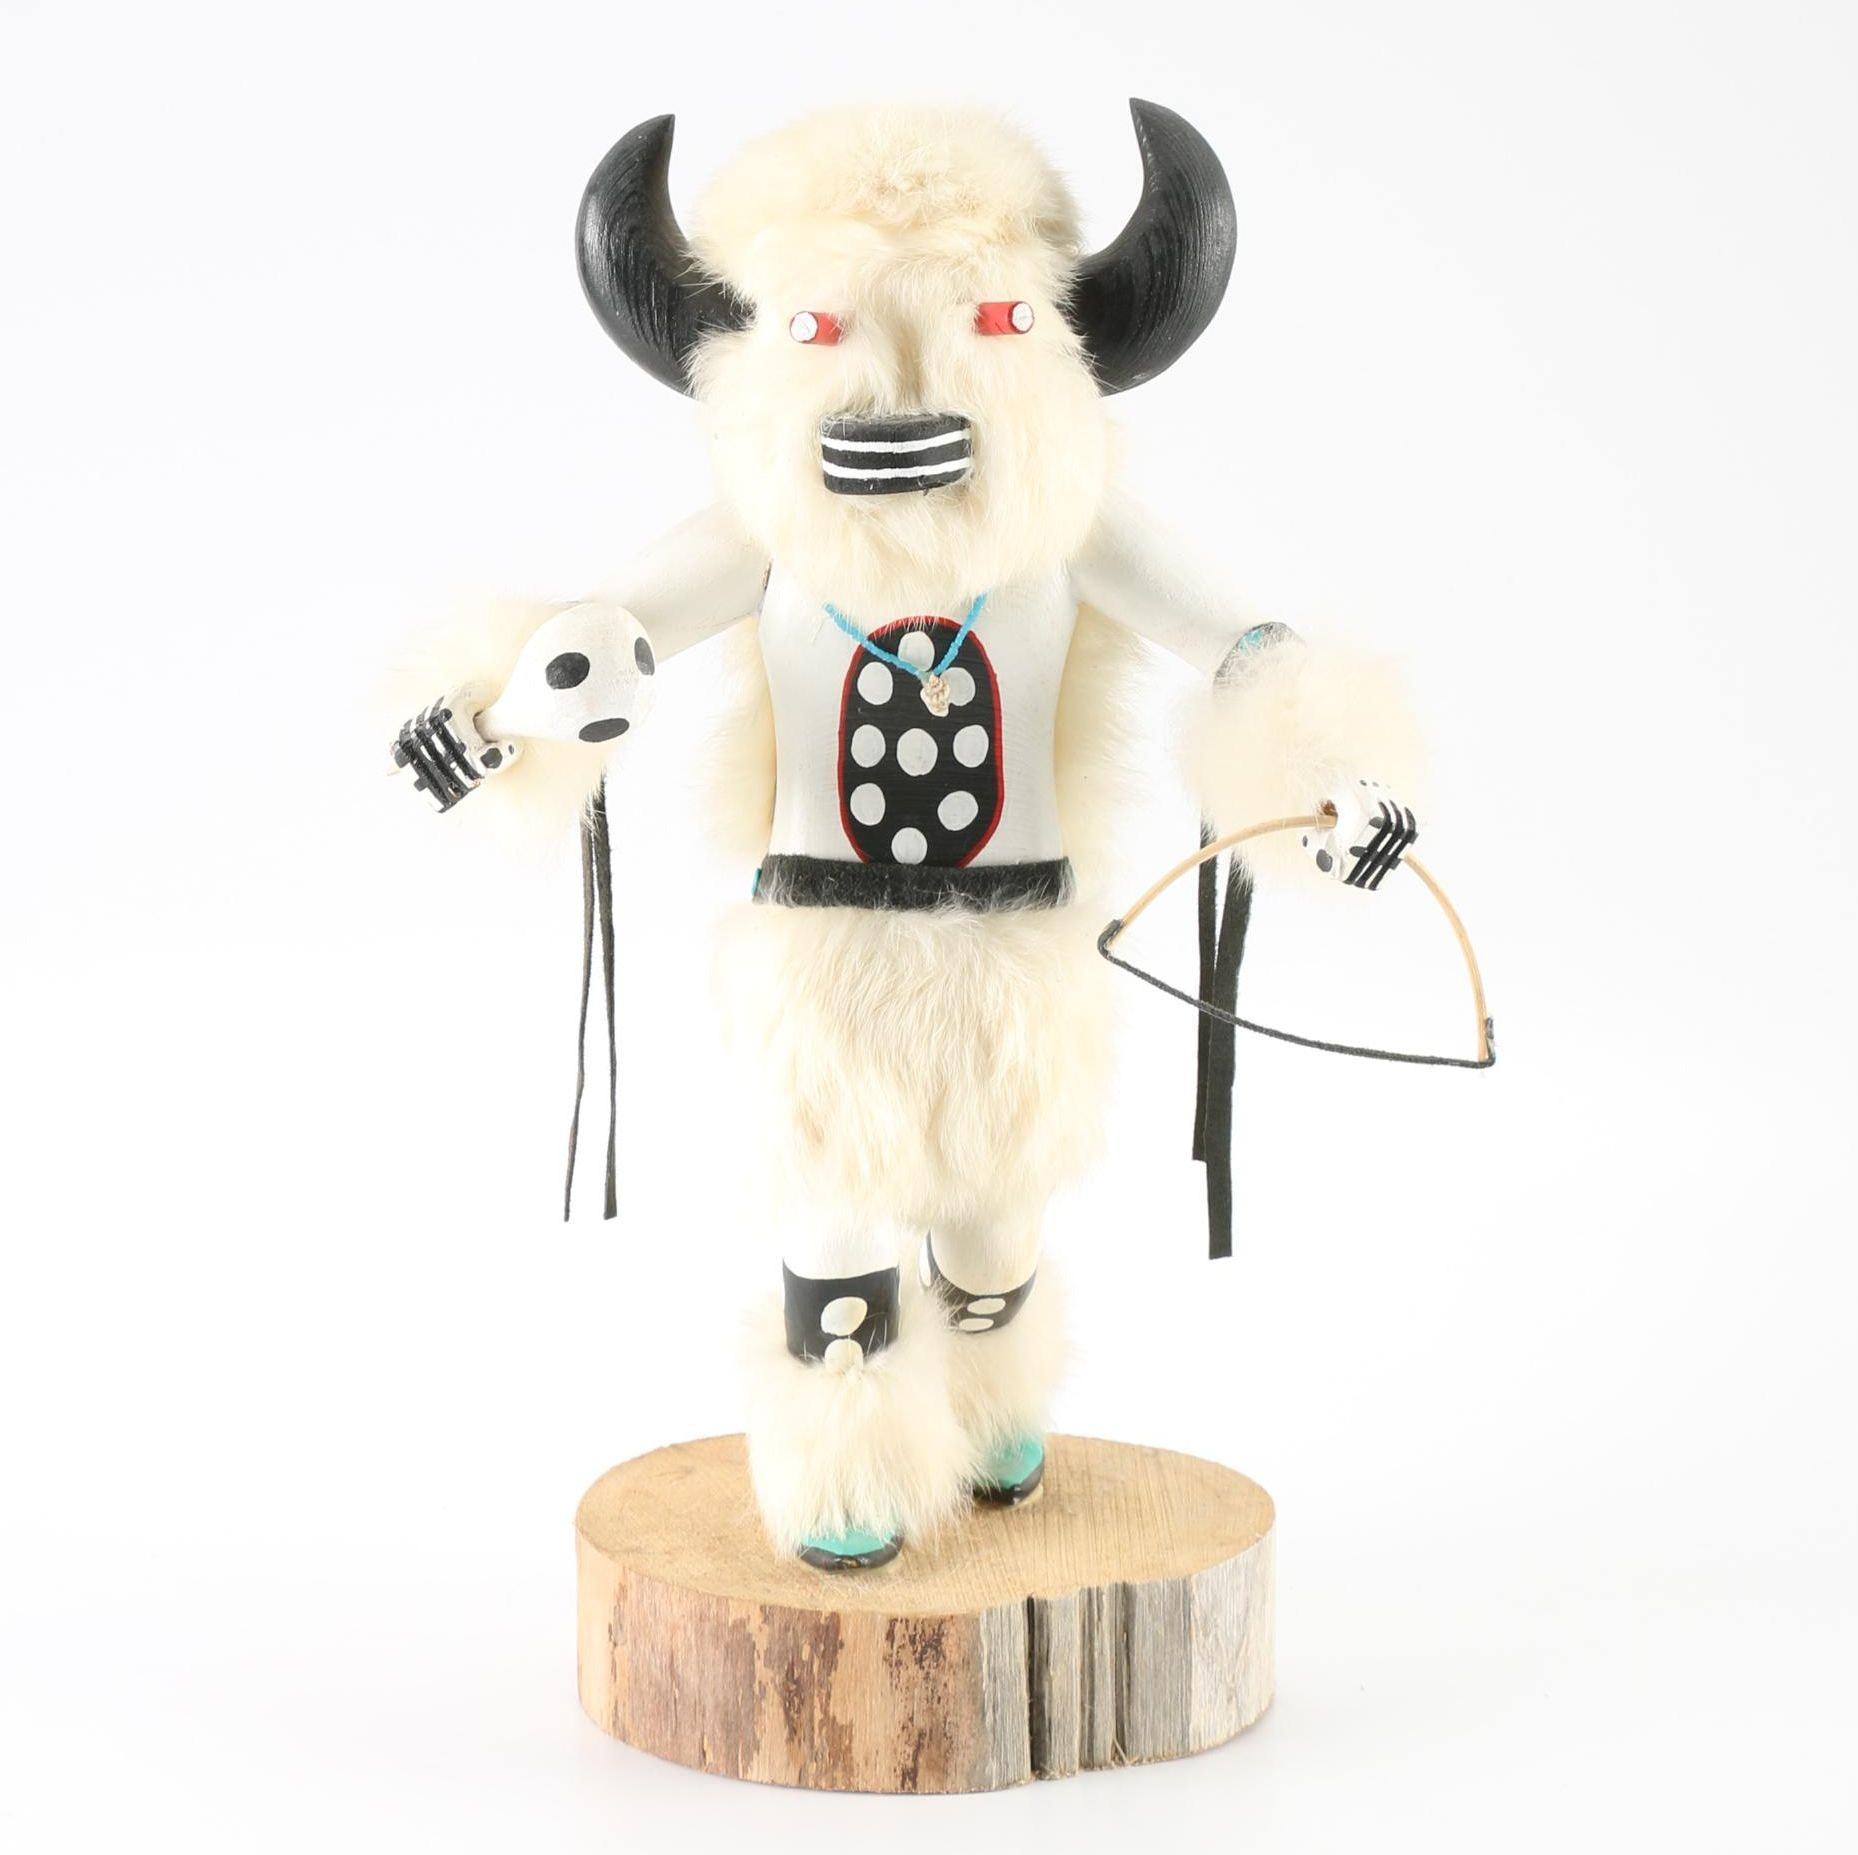 Signed C. Lee Native American Buffalo Kachina Doll